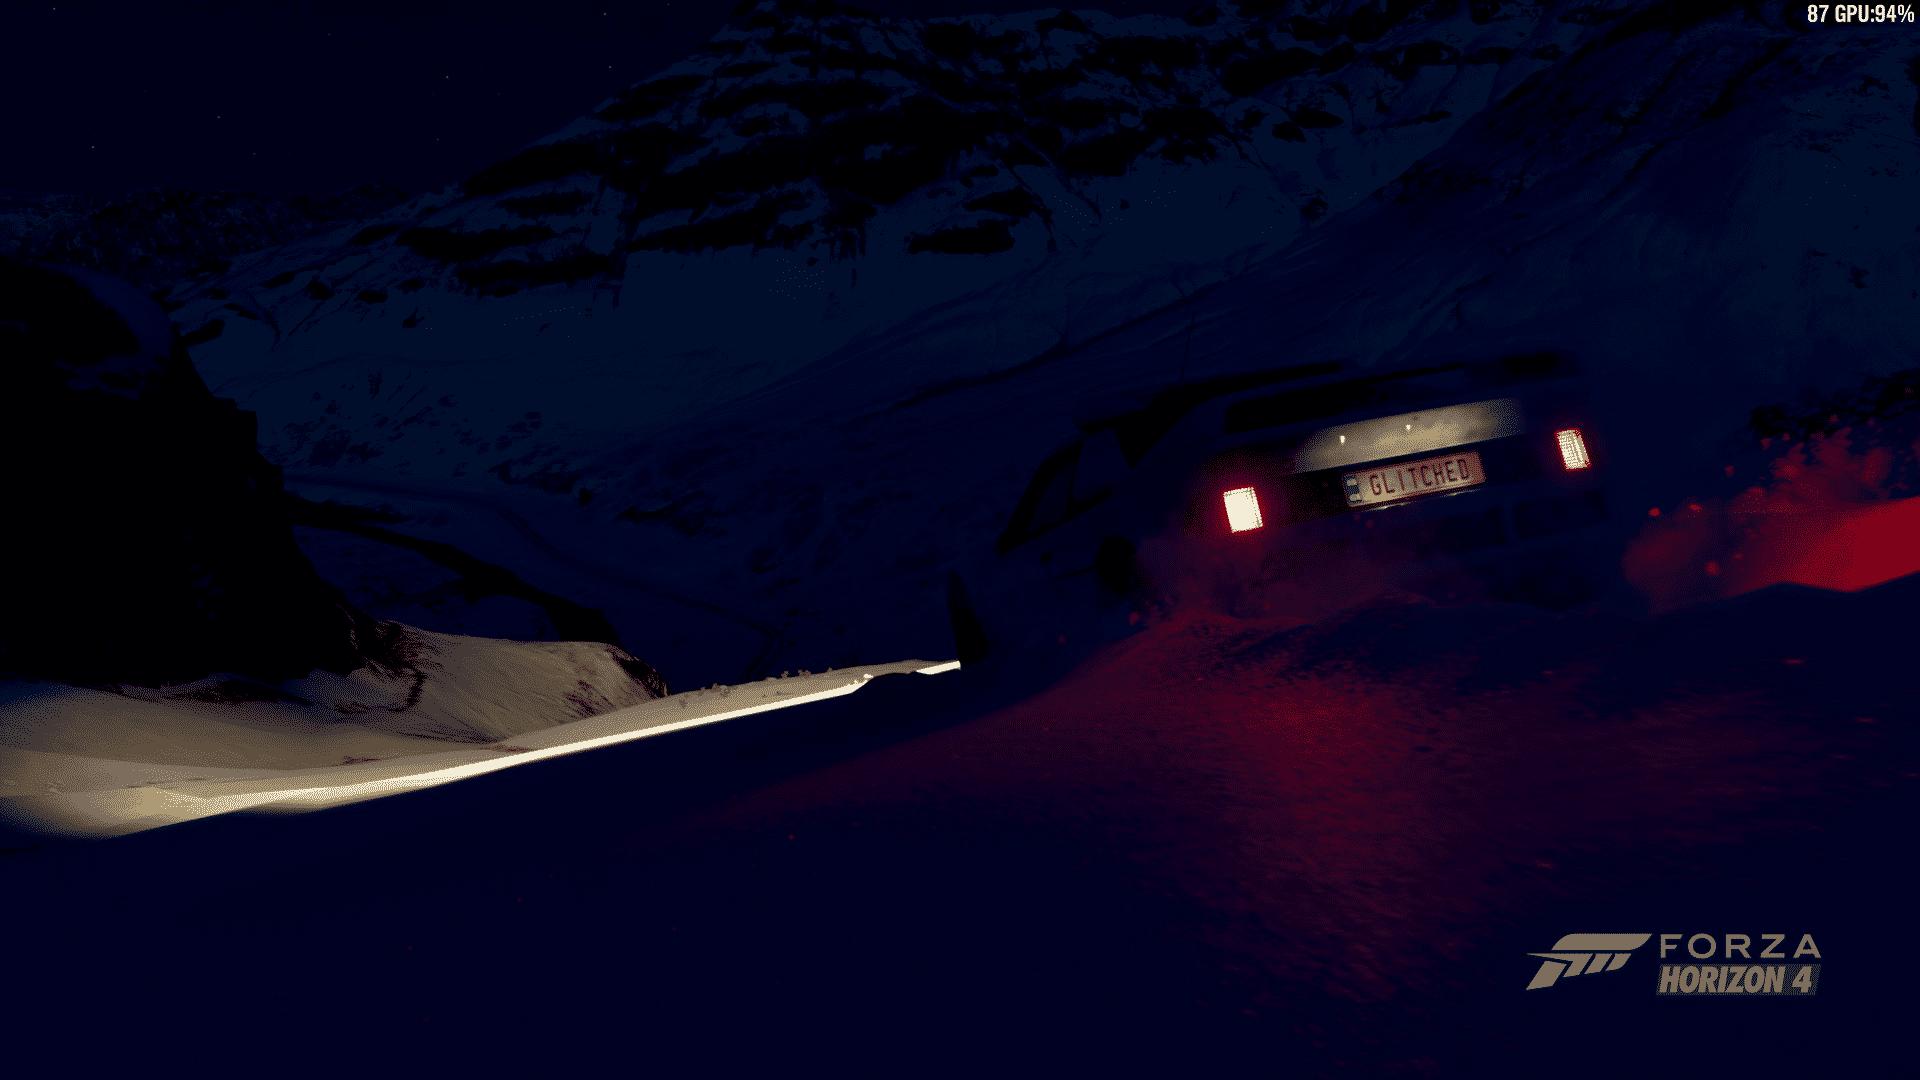 Forza Horizon 4 Review